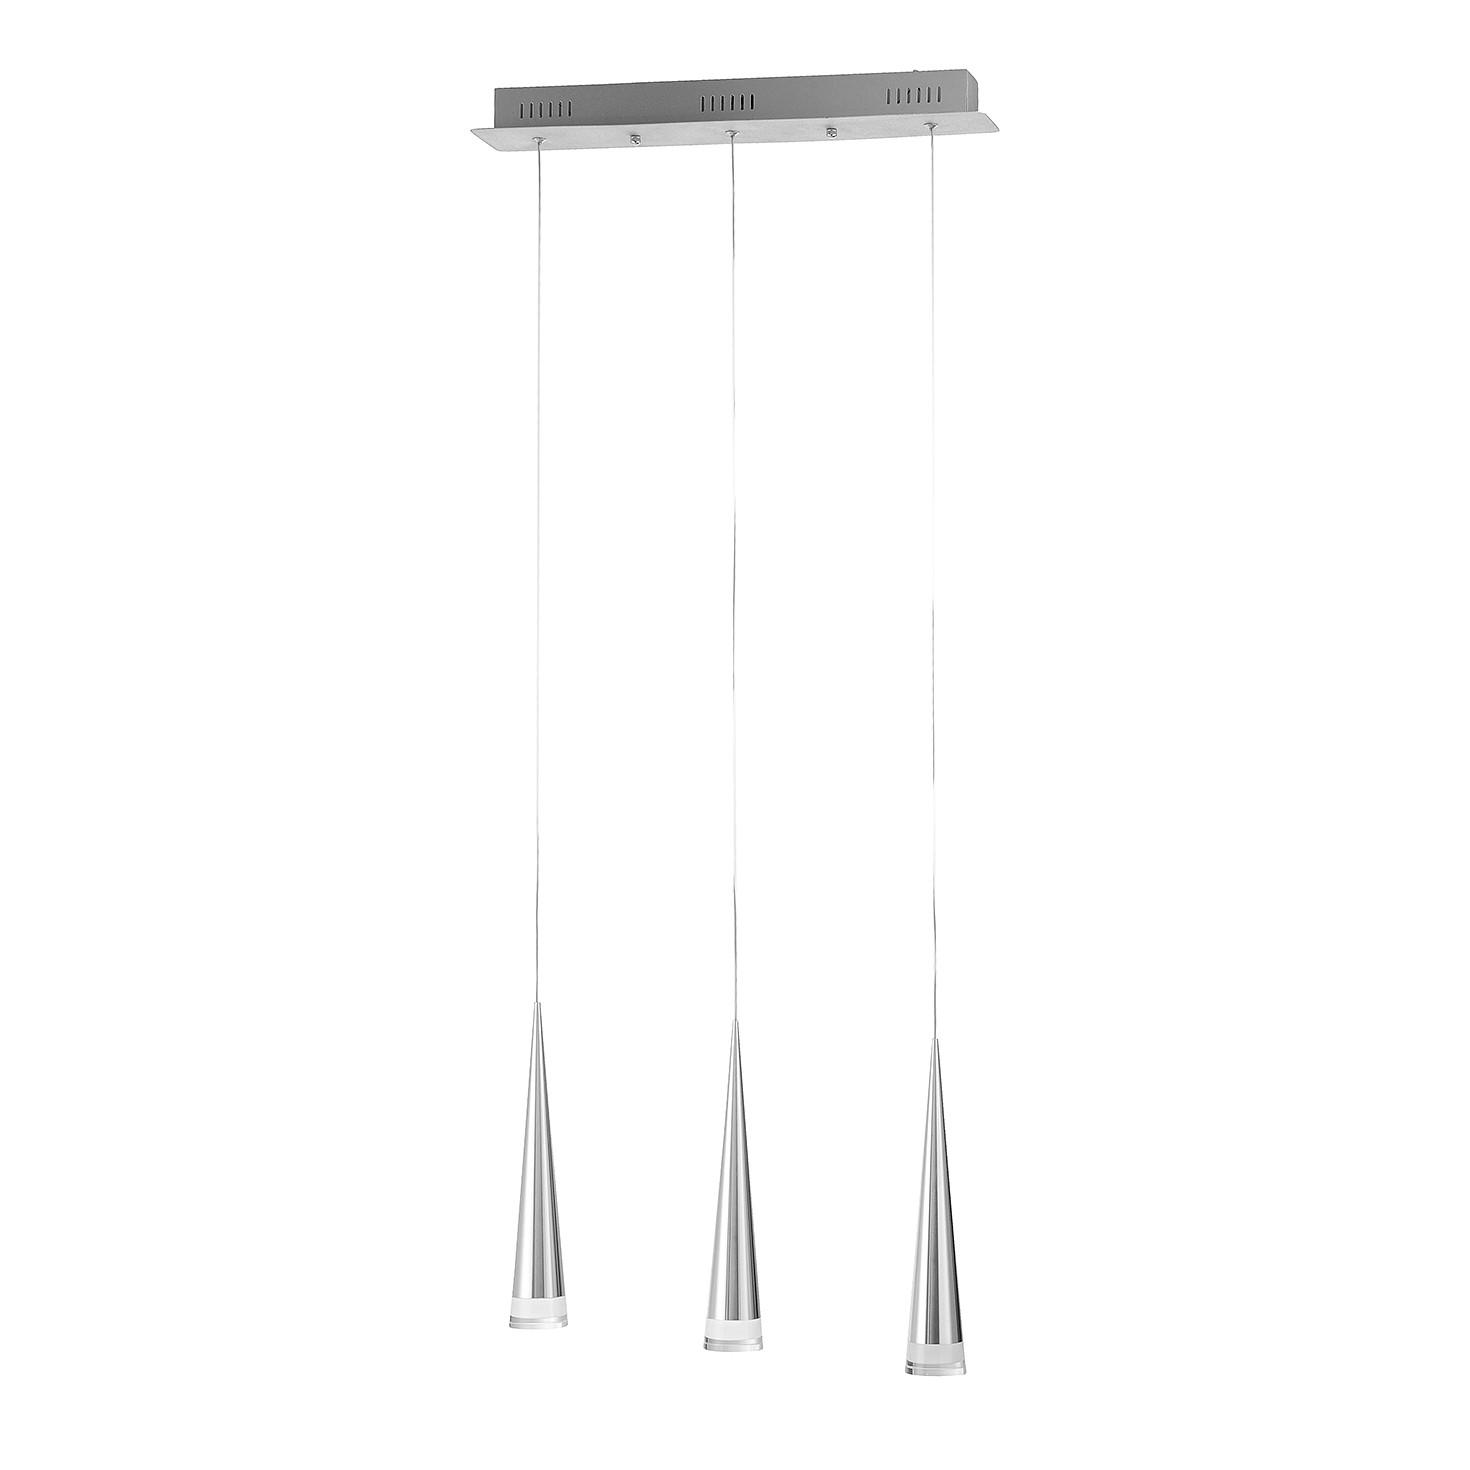 LED-Pendelleuchte Gota ● Aluminium ● Silber- Paul Neuhaus A+